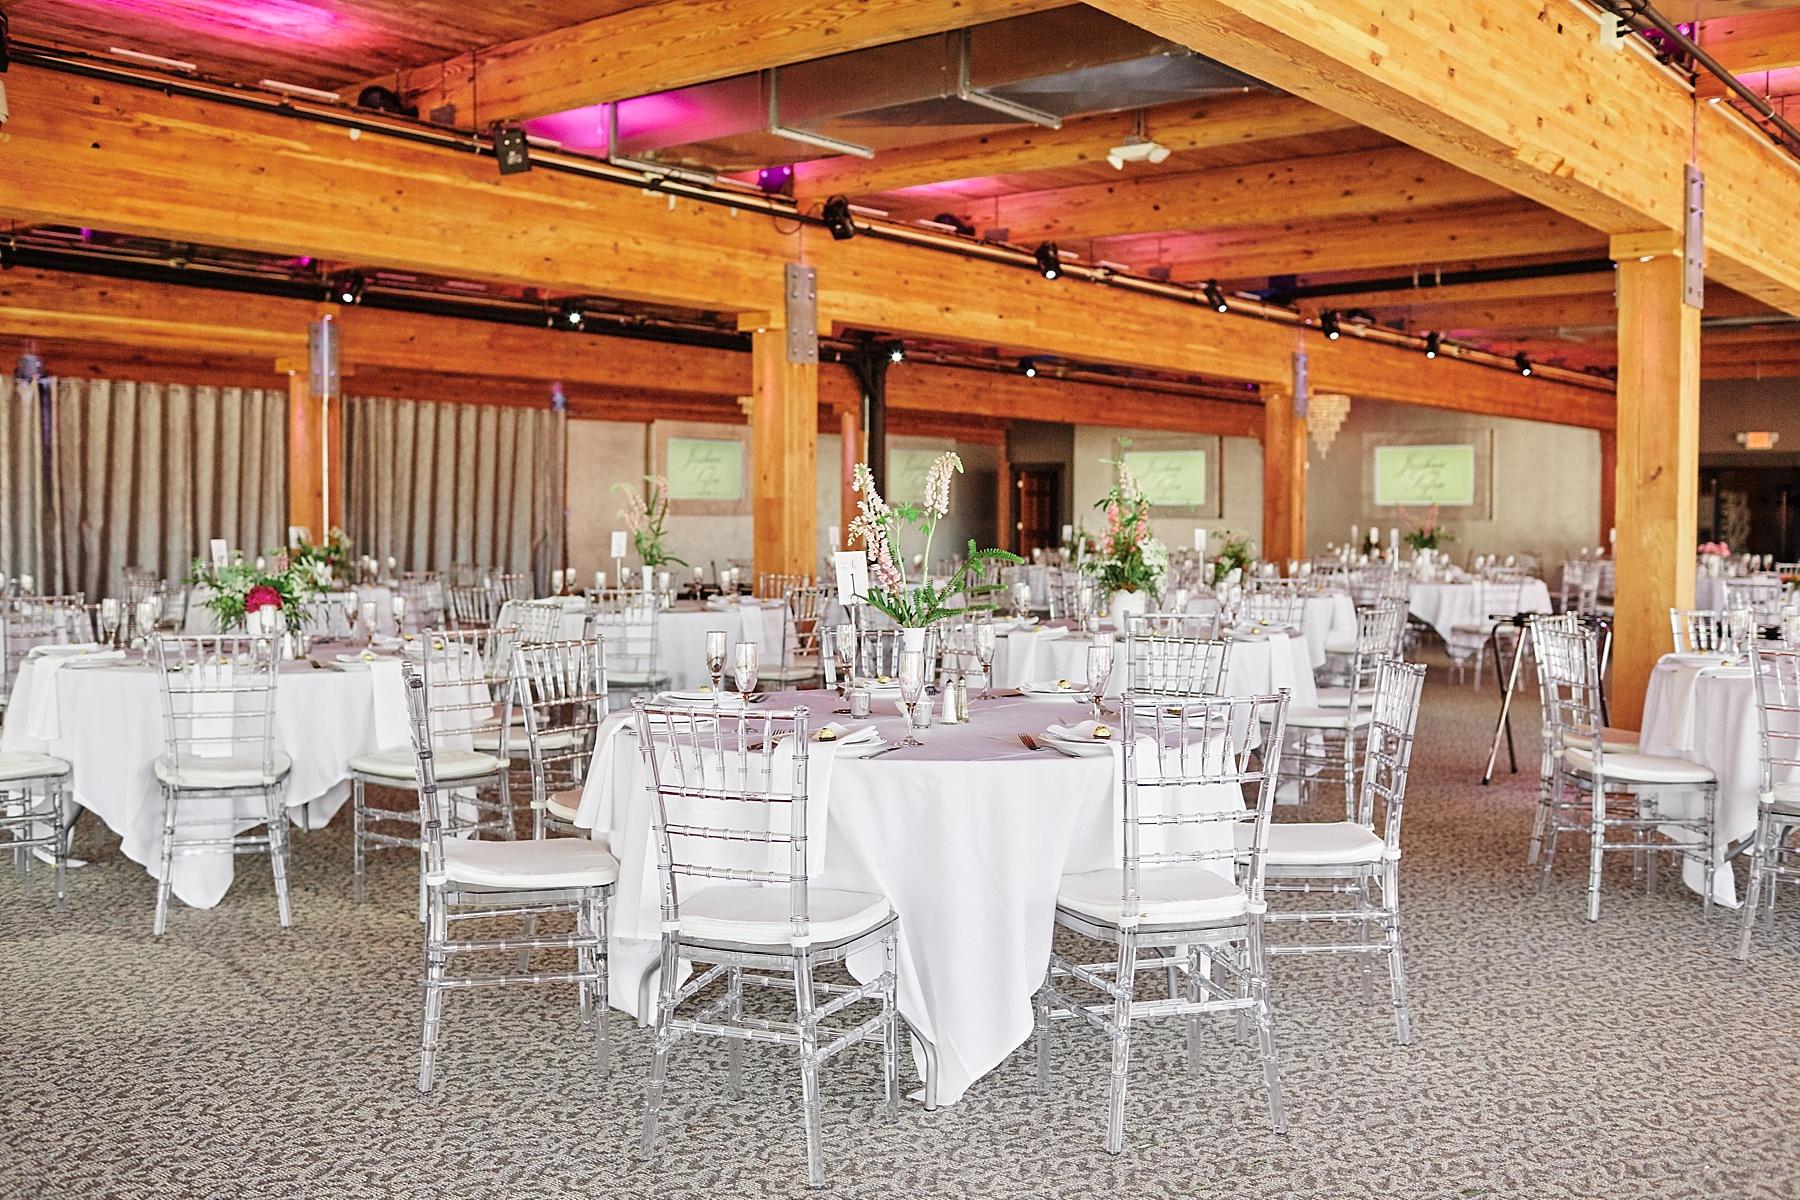 ABULAE-Wedding-Saint-paul-MN-Josh-Sofia-Wedding-Mears-Park_0877.jpg